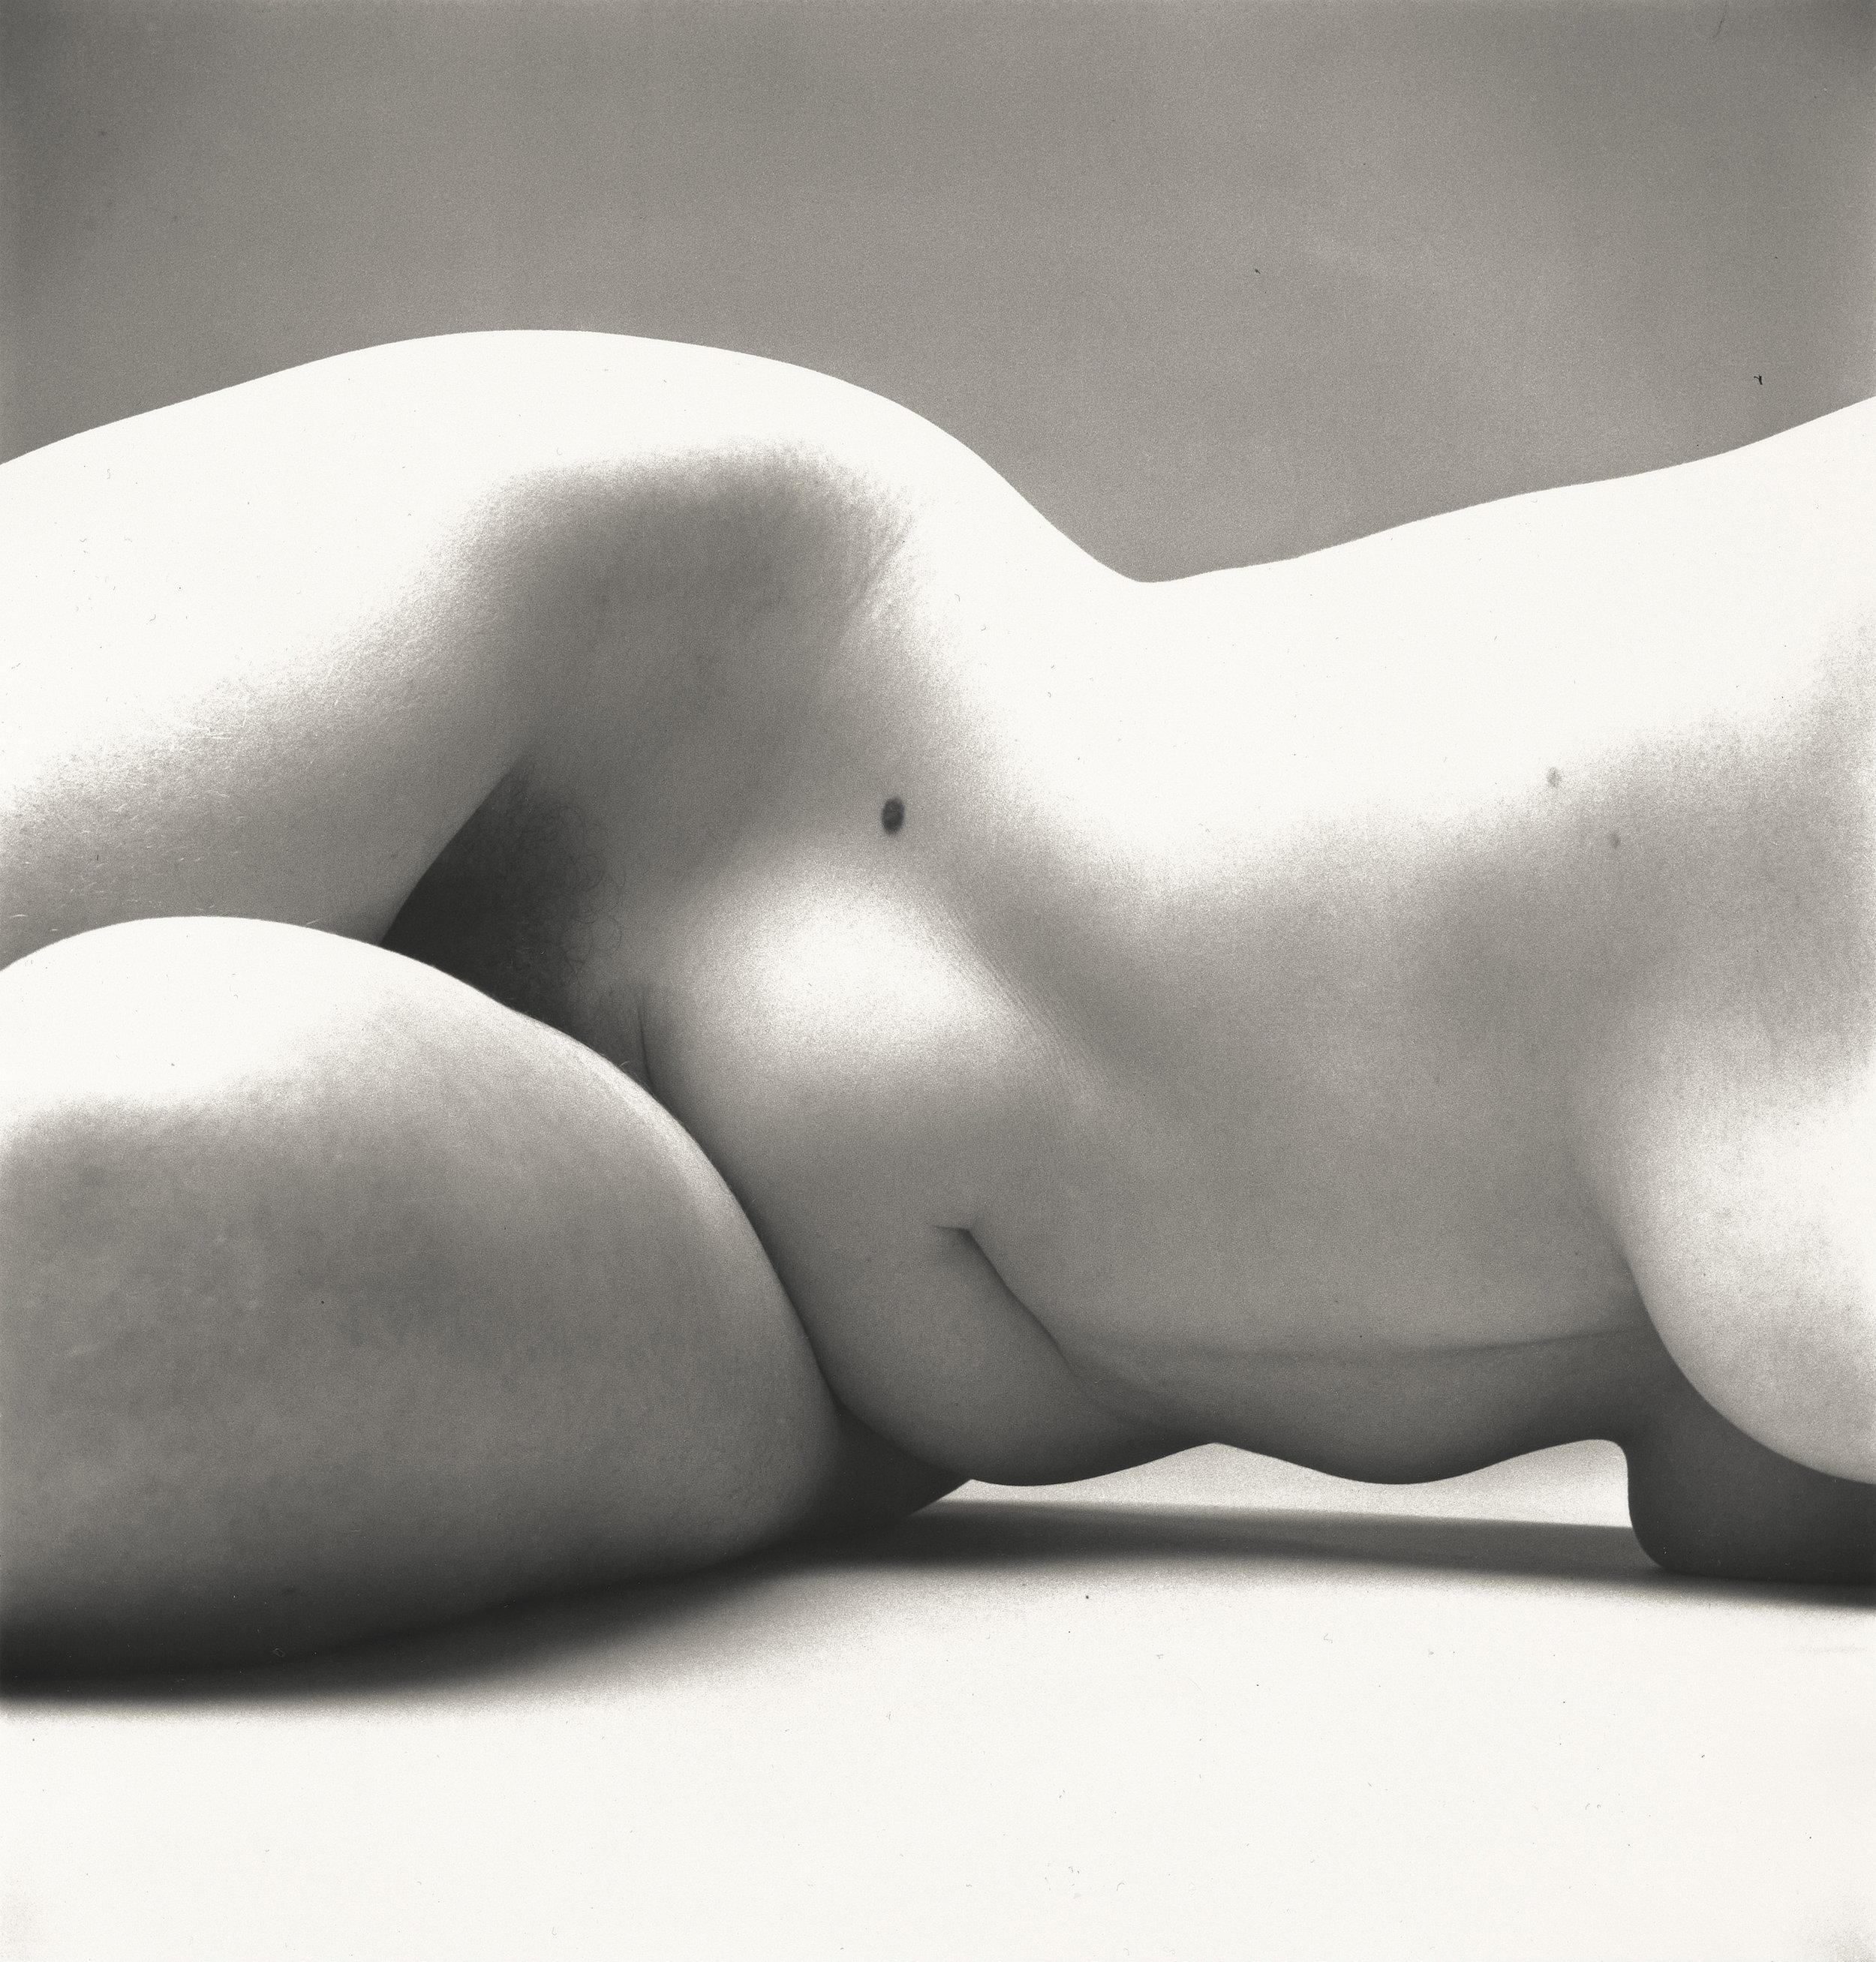 Irving Penn (American, 1917–2009)    Nude No. 72 , New York, 1949–50    Gelatin silver print  15 ⅝ × 14 ¾ in. (39.7 × 37.5 cm)  The Metropolitan Museum of Art, New York,  Gift of the artist, 2002  © The Irving Penn Foundation